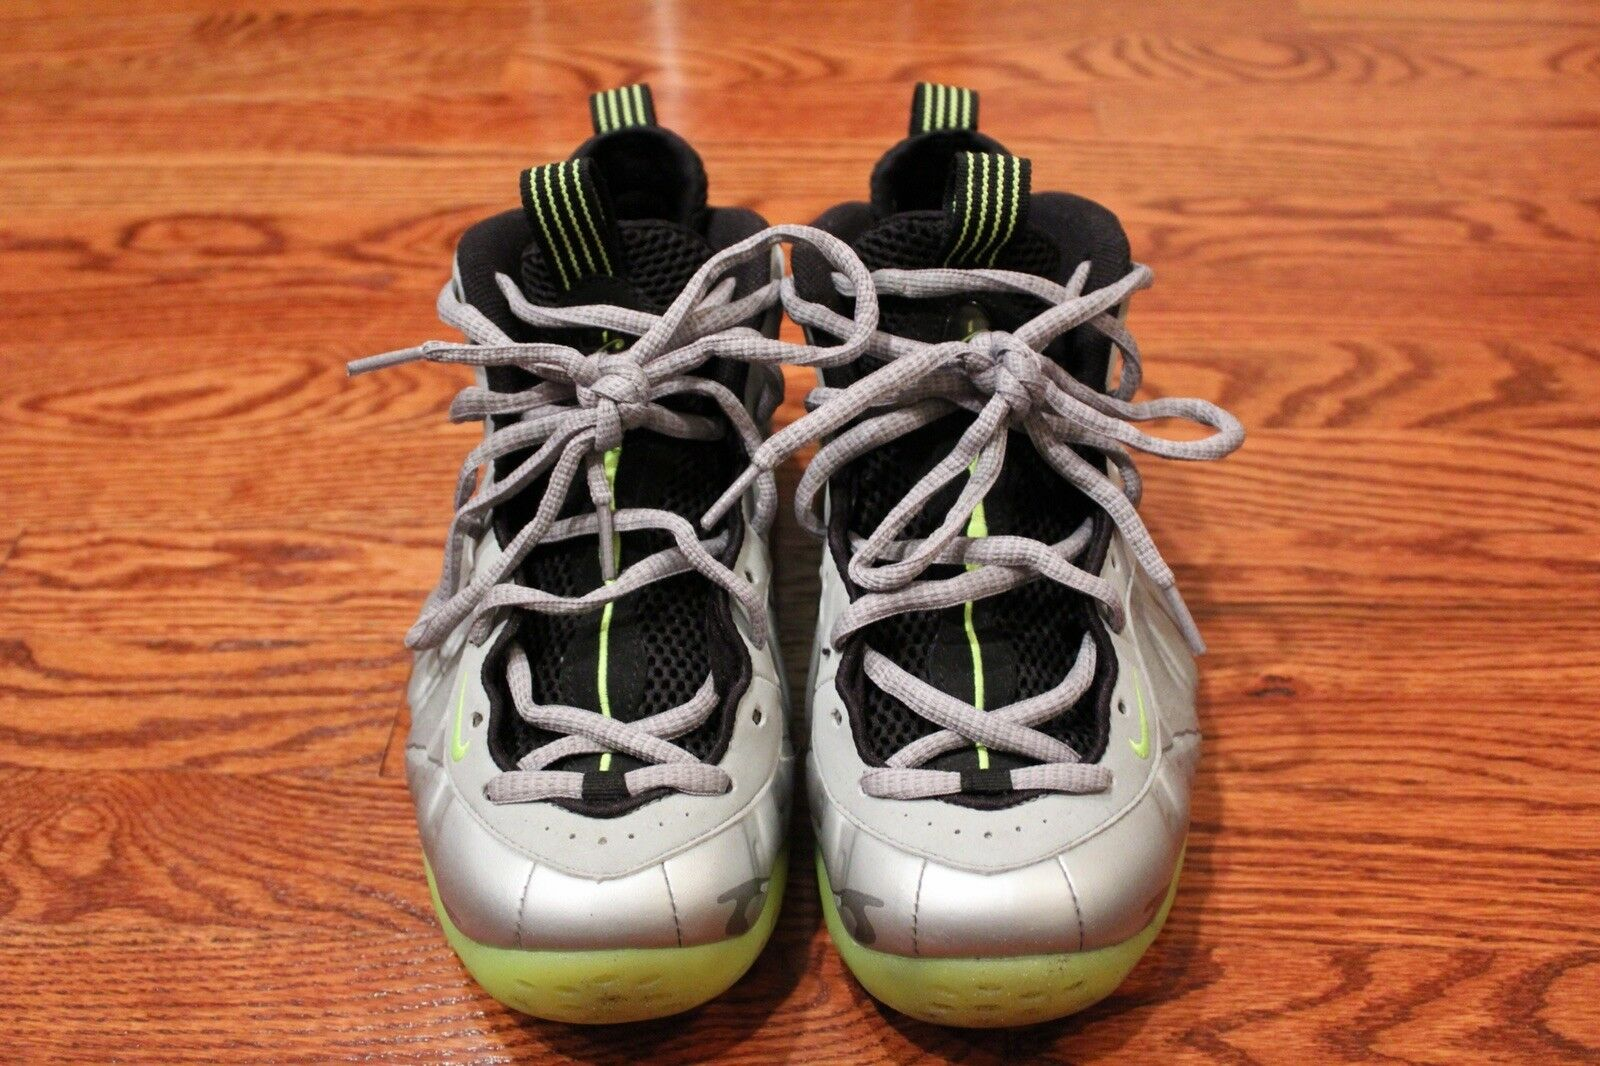 Nike Air Foamposite One PRM Silver Volt Camo 3M Size 8.5 penny/basketball/posite